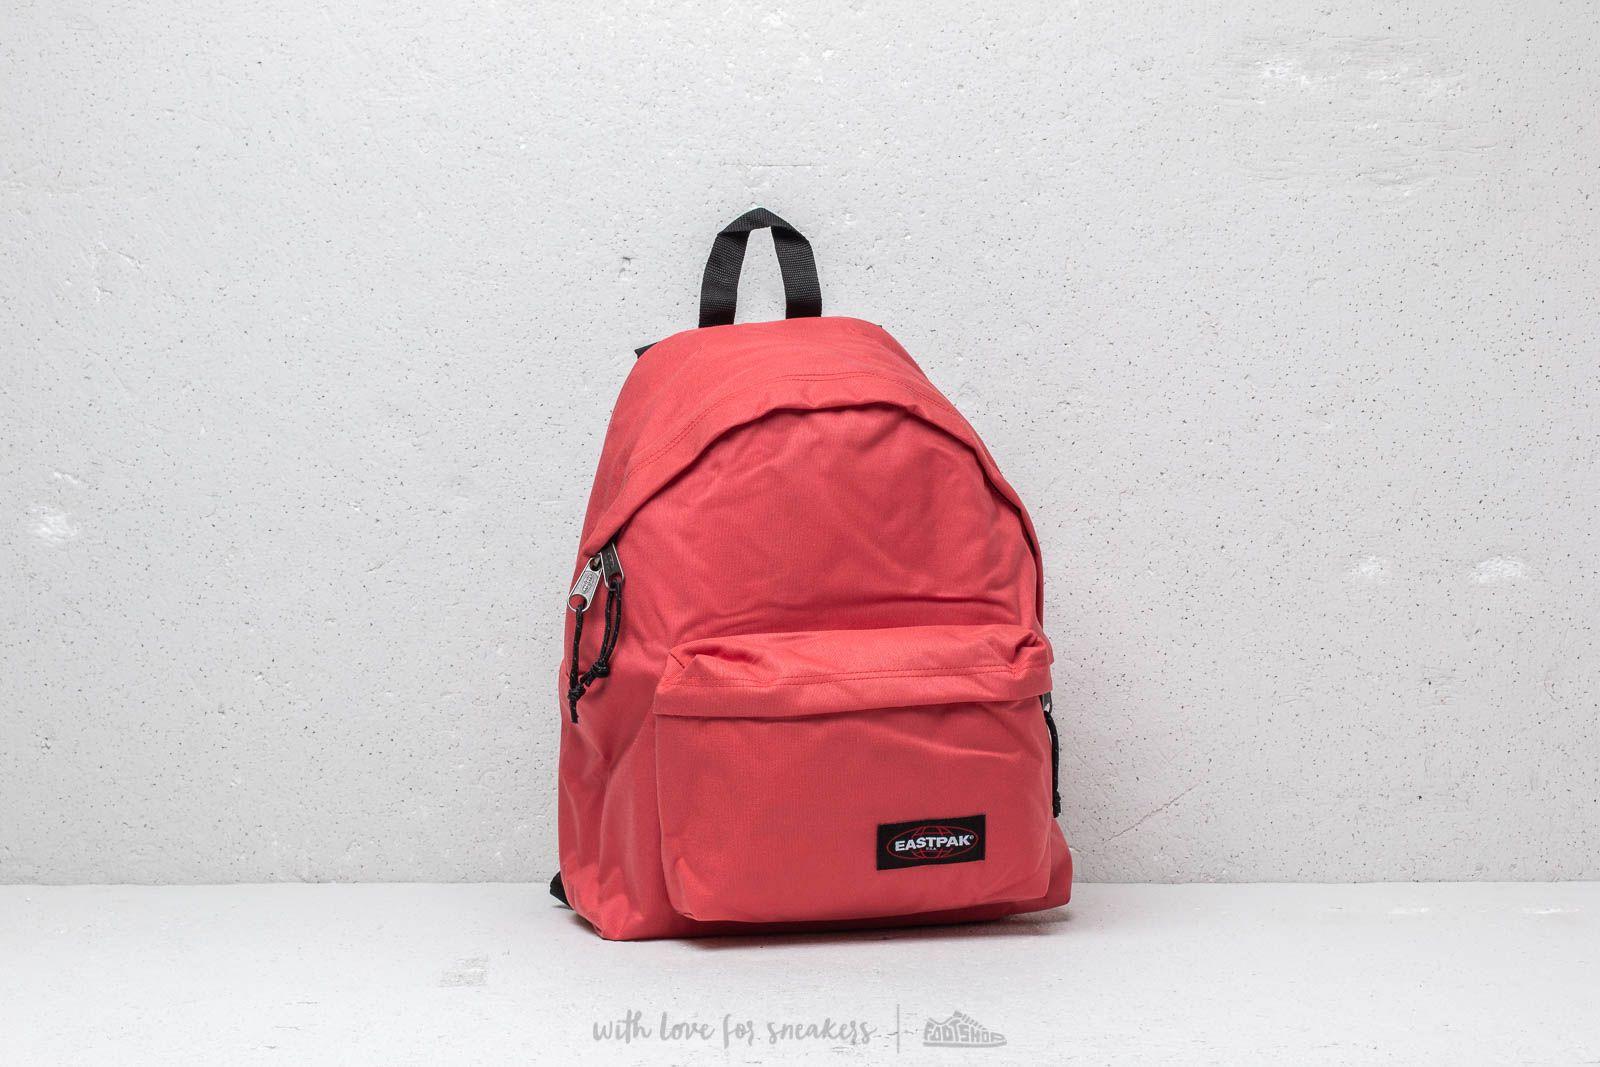 Eastpak Padded Pak'R Backpack Rustic Rose za skvelú cenu 36 € kúpite na Footshop.sk